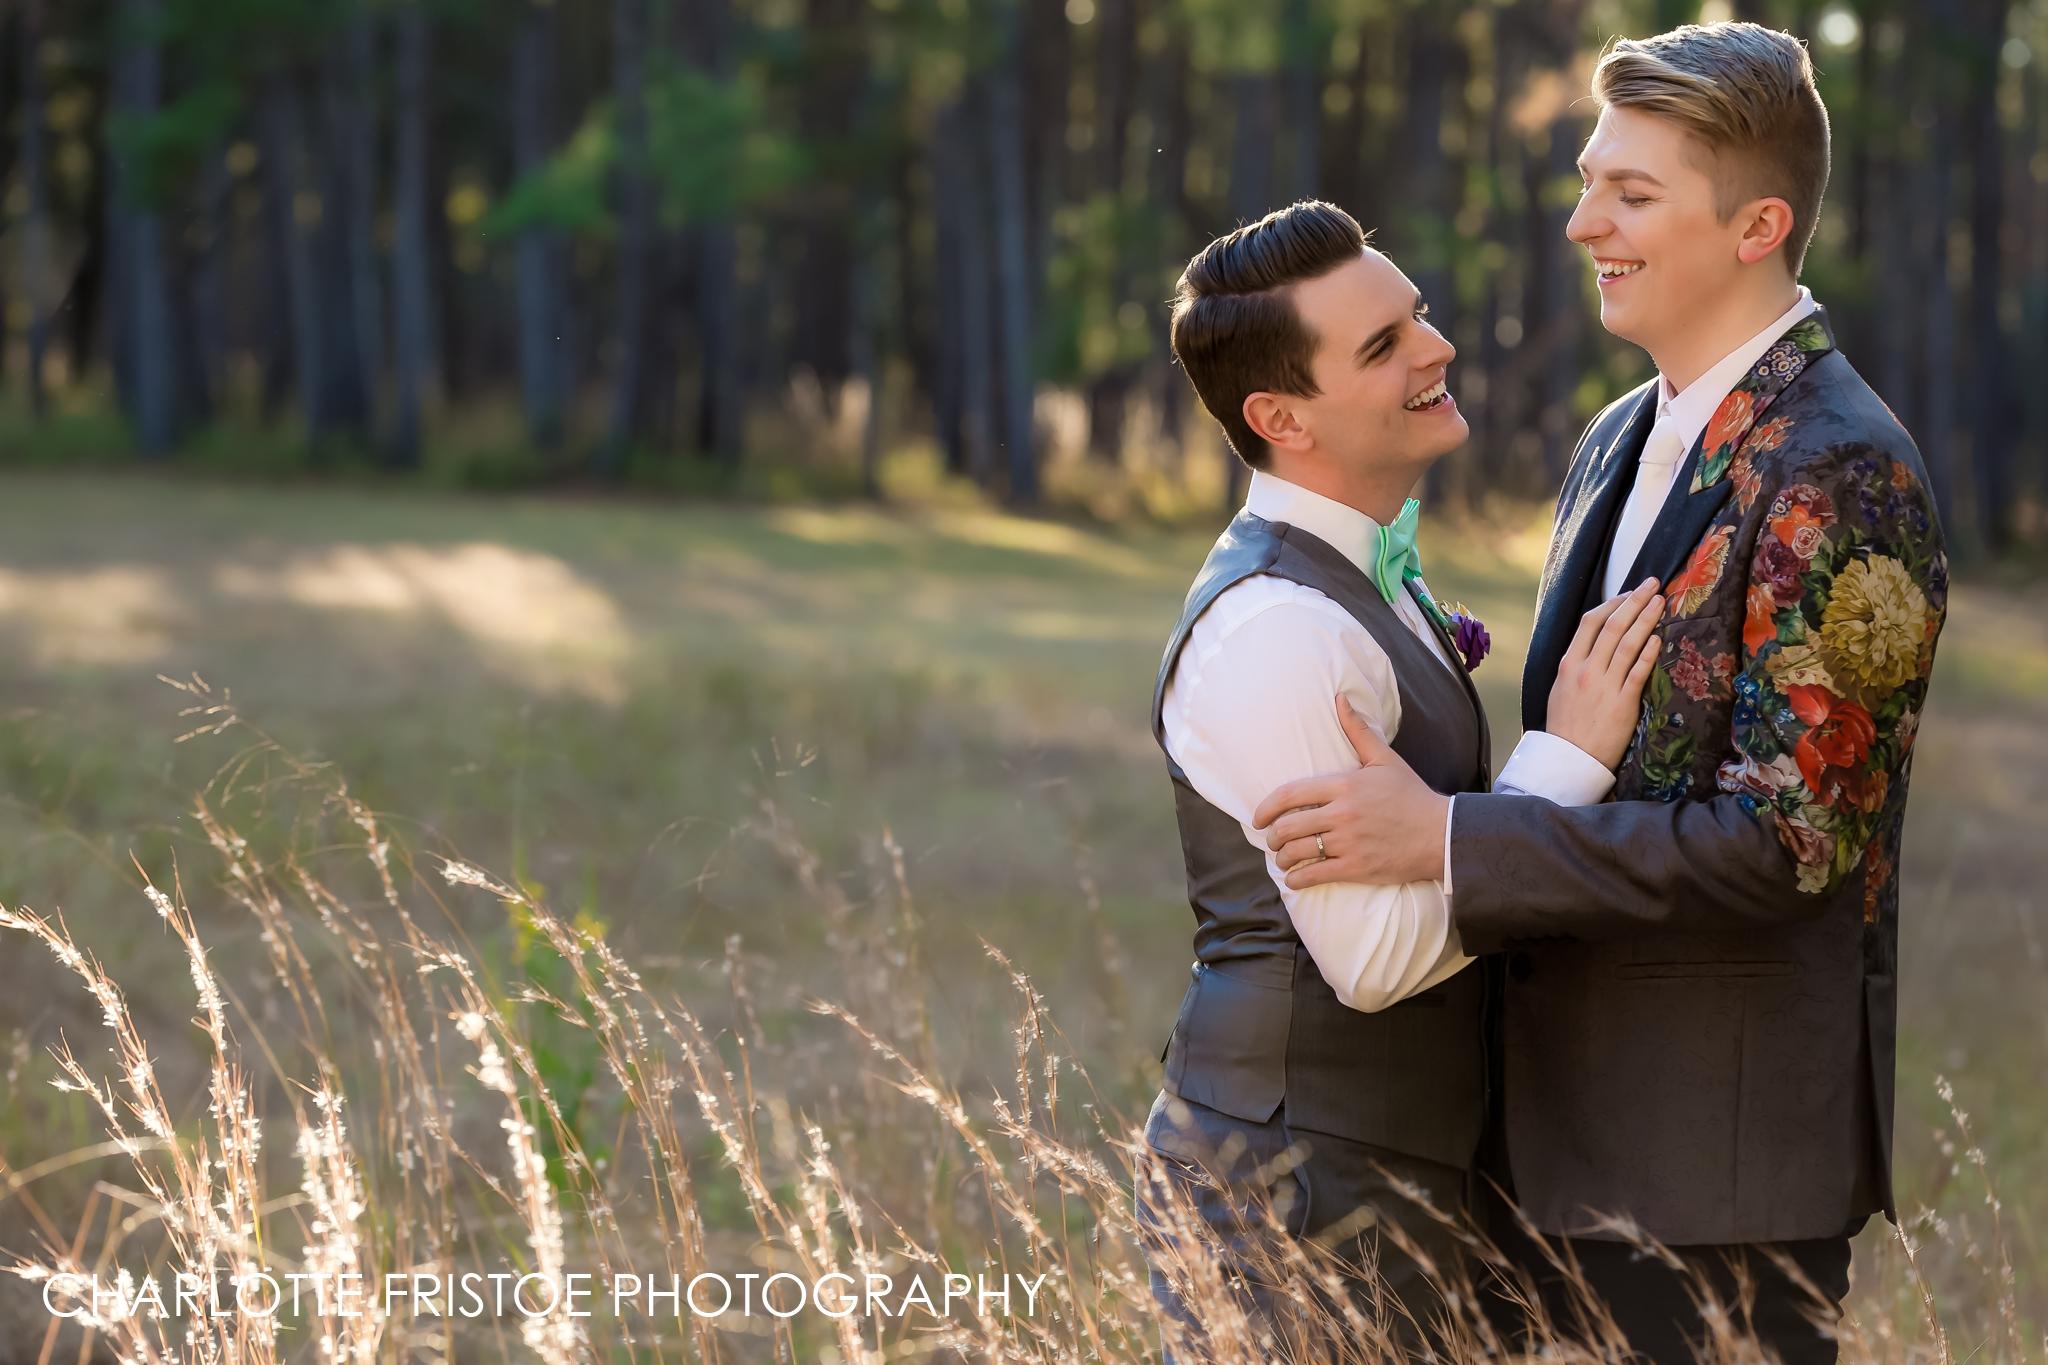 Charlotte Fristoe Tallahassee Wedding Photography-11.jpg